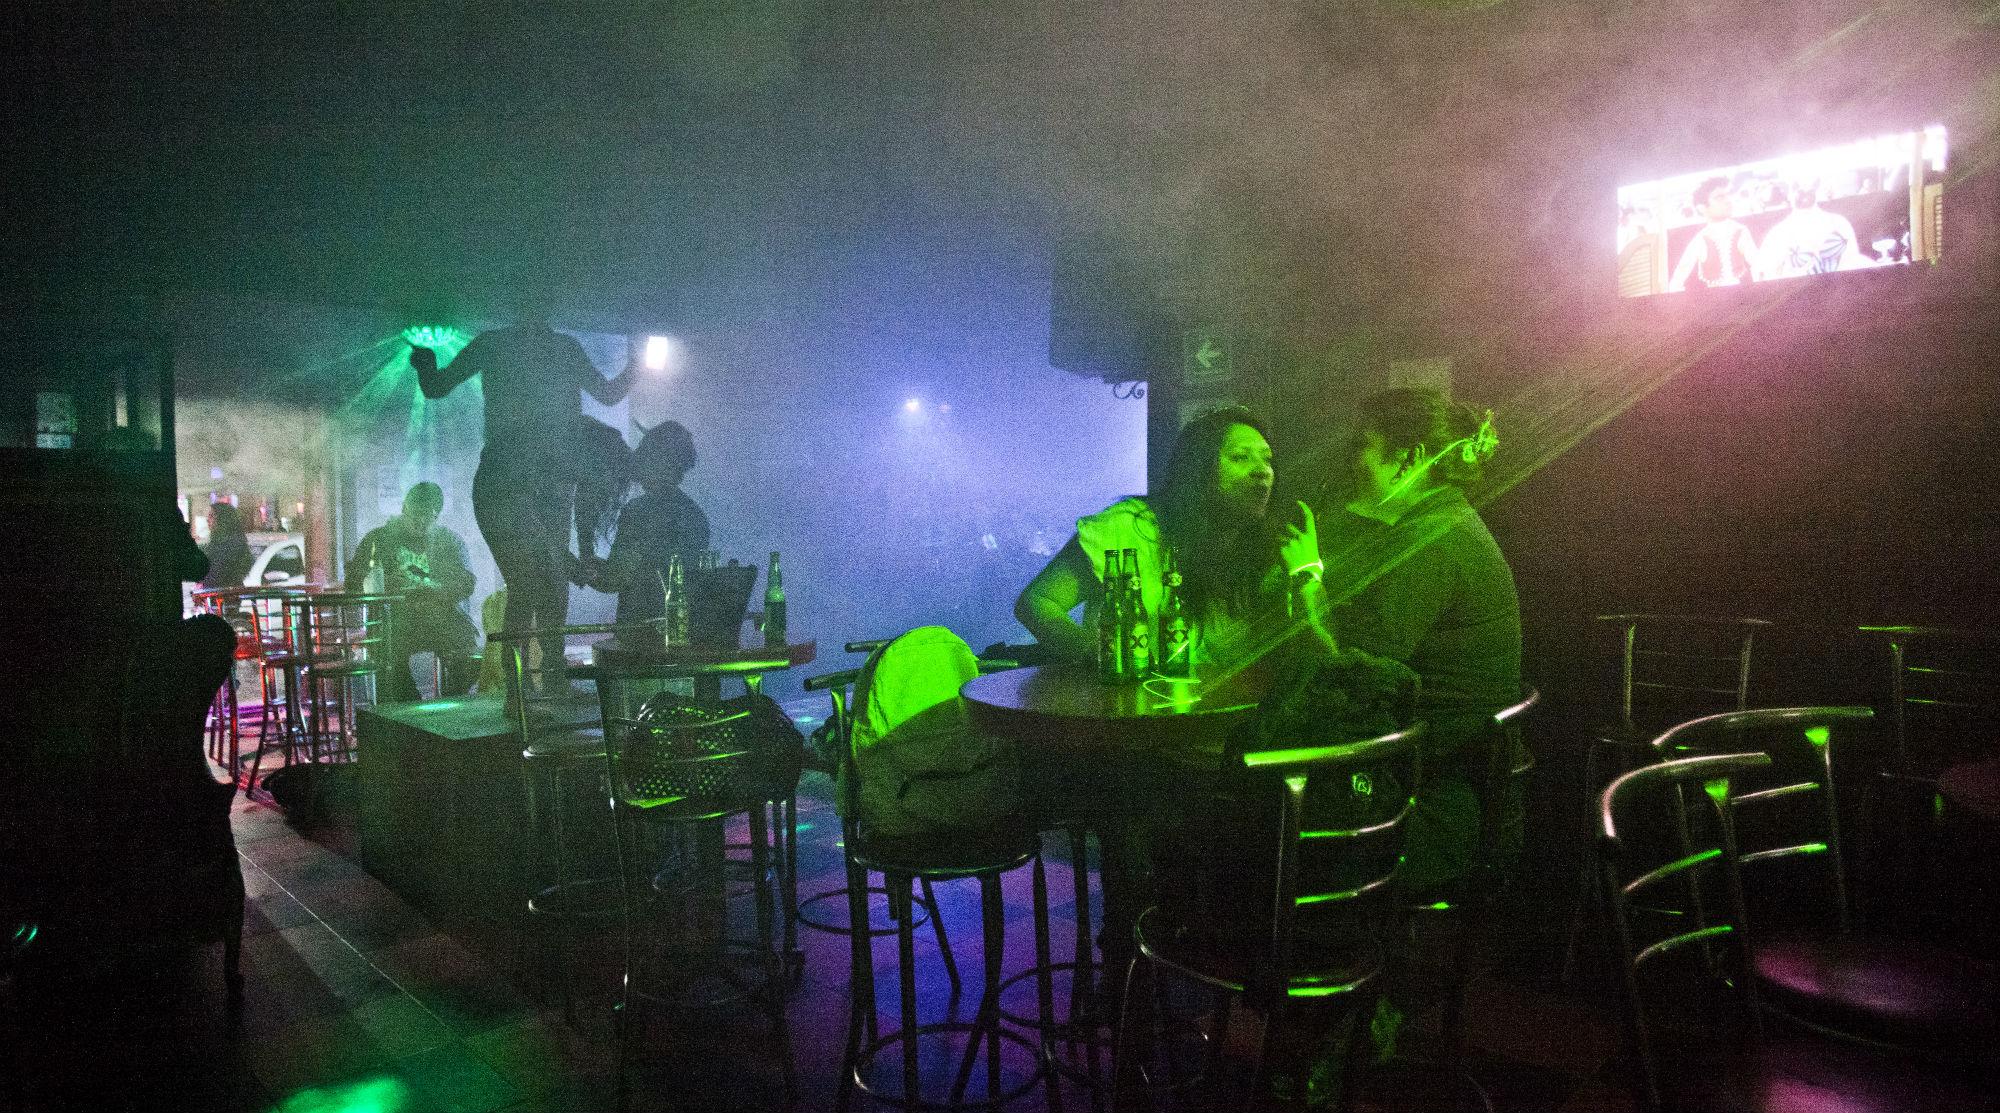 Le Cirque Nuit Bar